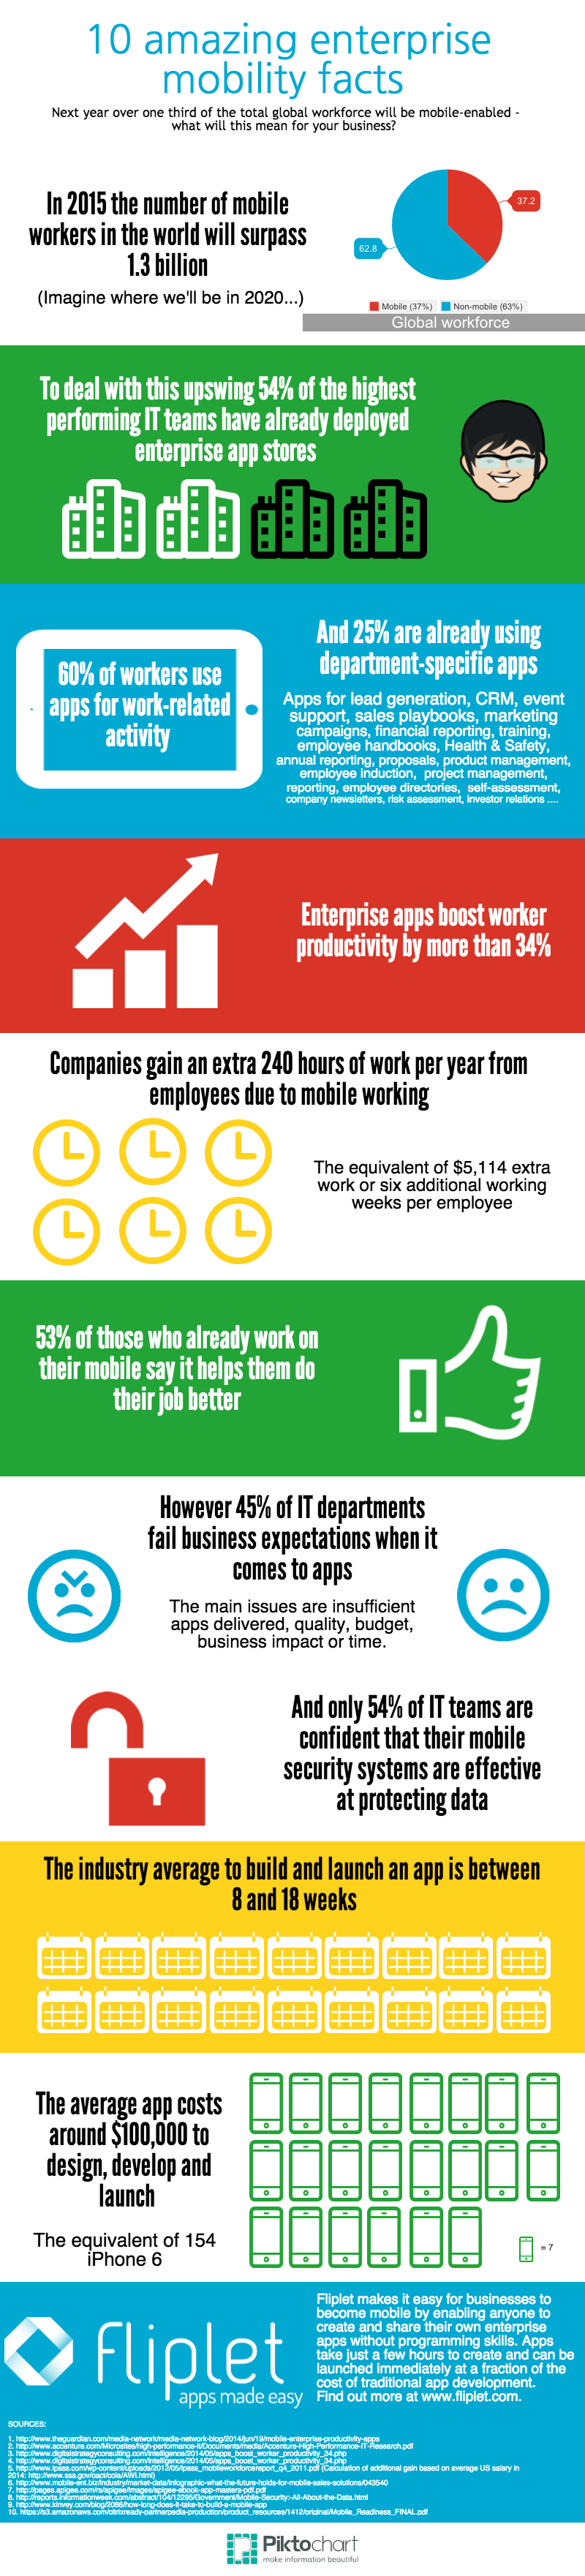 ten amazing enterprise mobility statistics